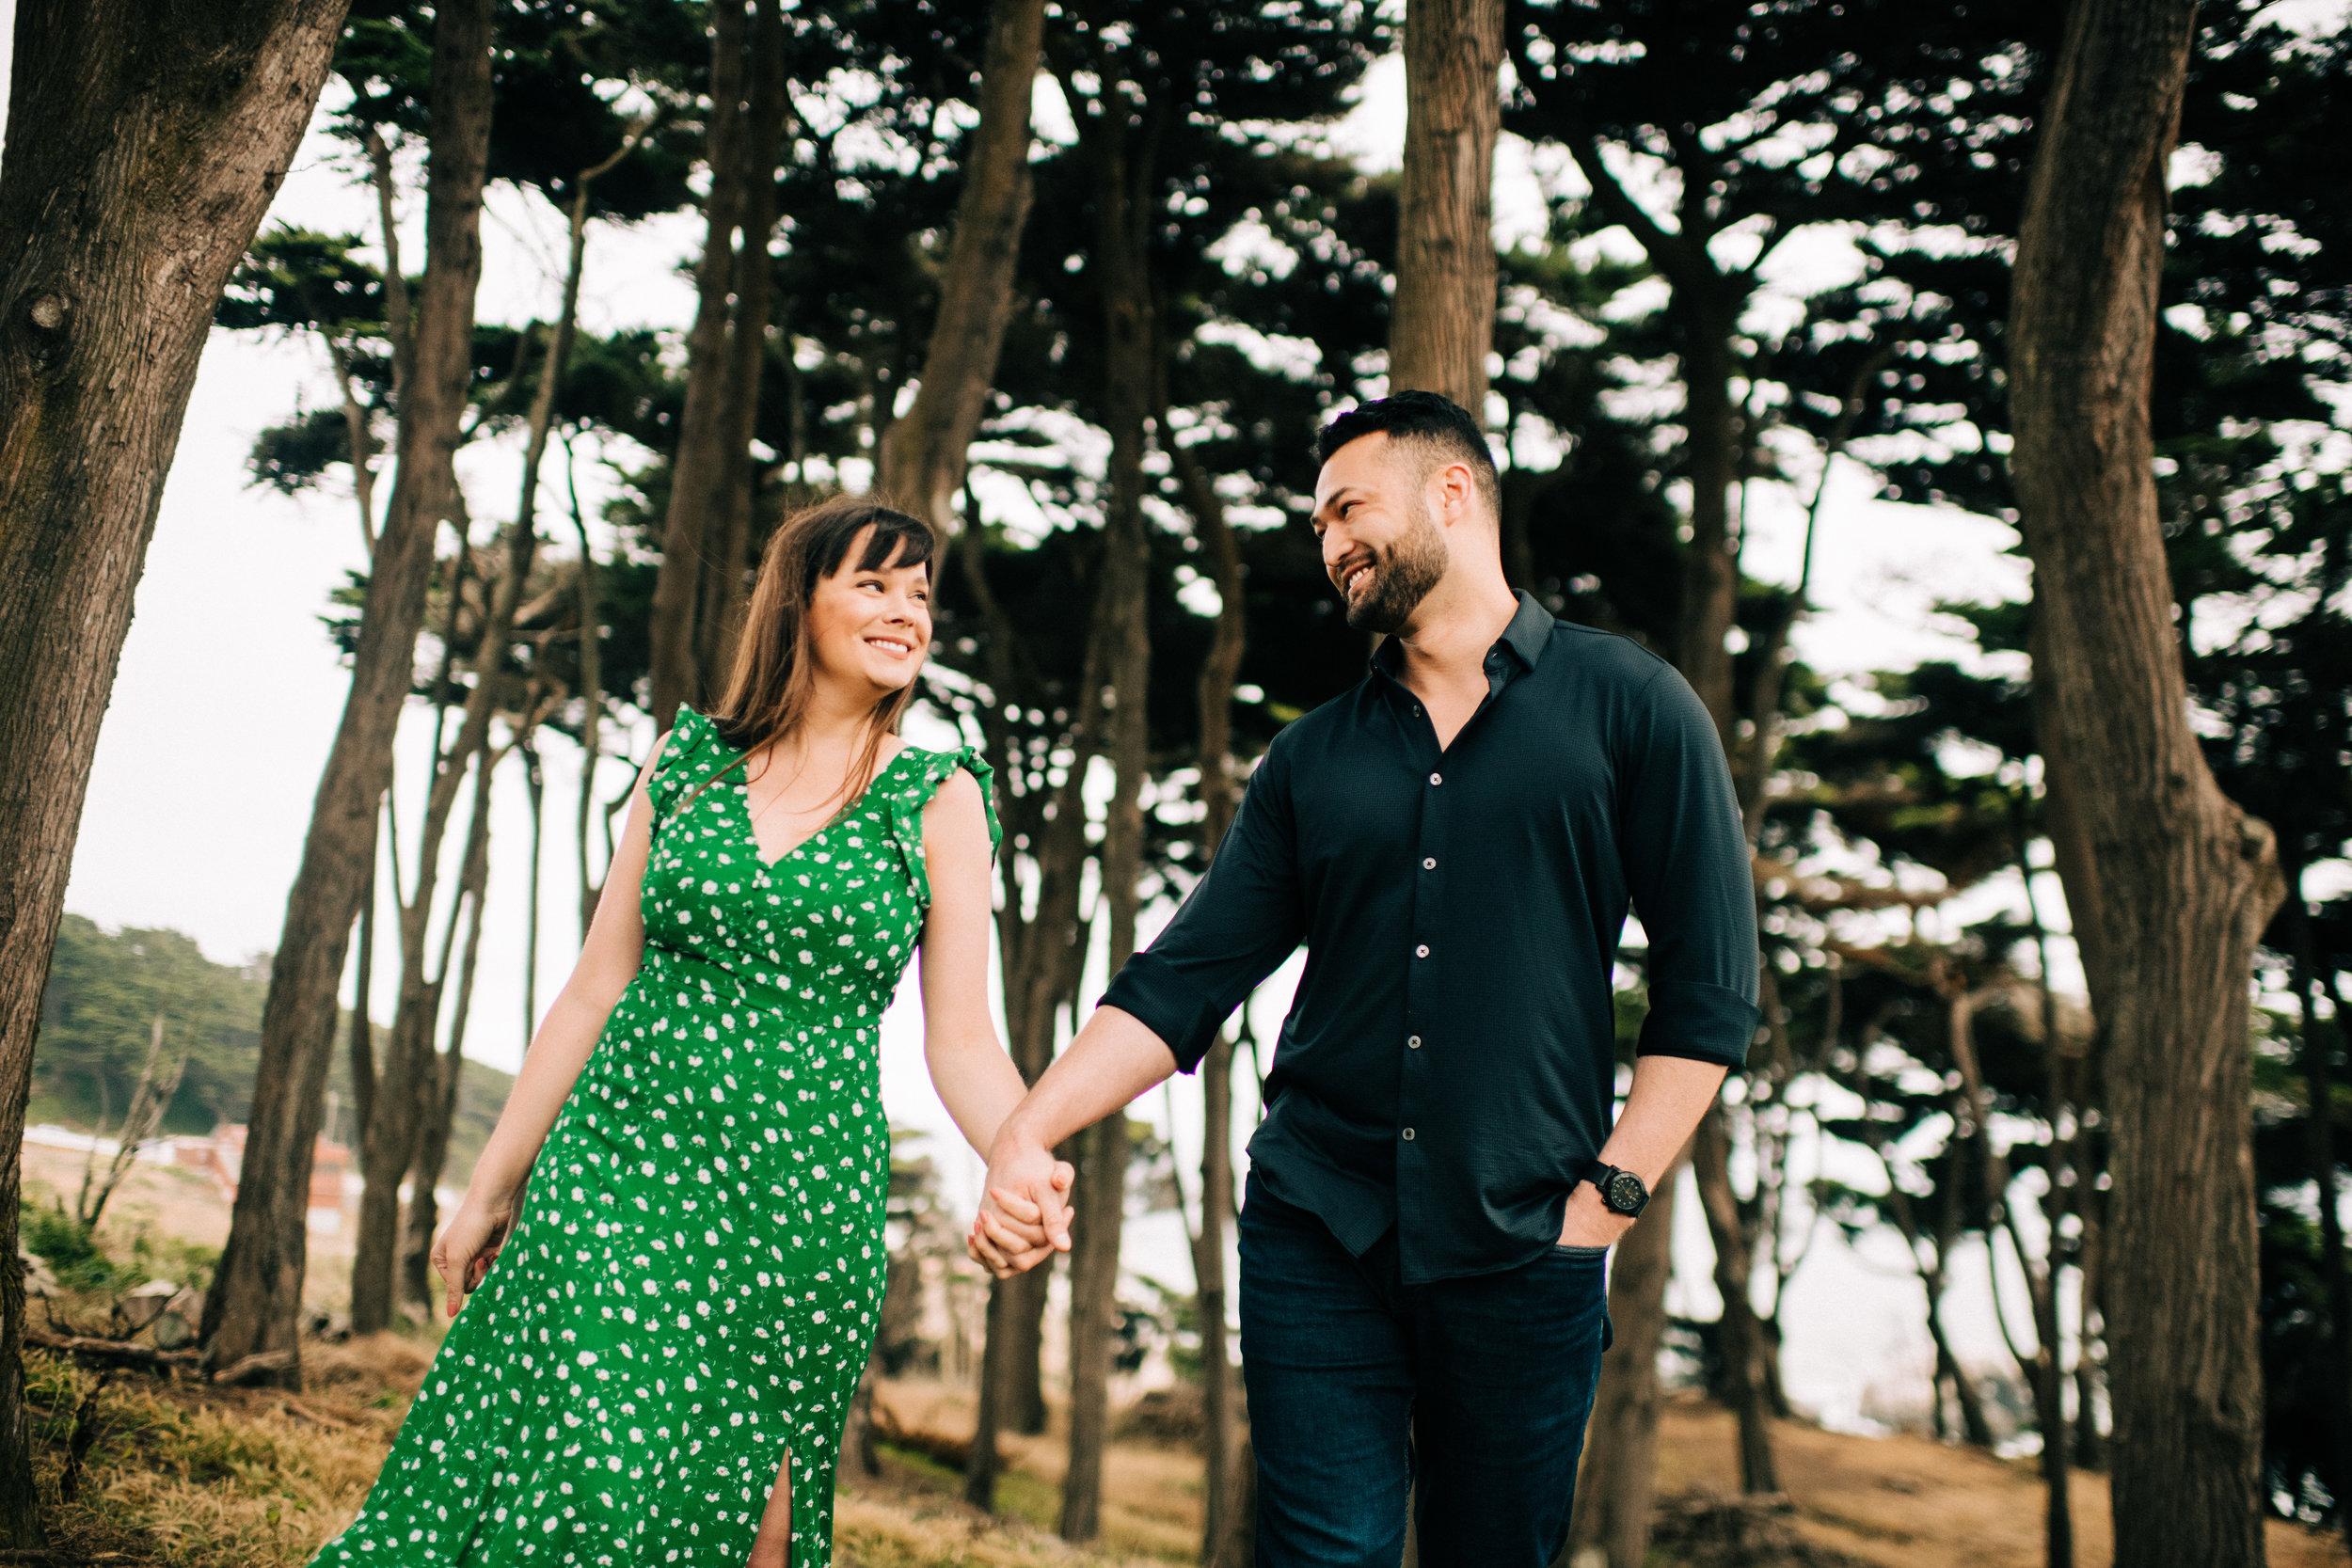 bay area lands end sutro baths oakland san francisco engagement wedding nontraditional fun creative eclectic photographer magic-100.jpg